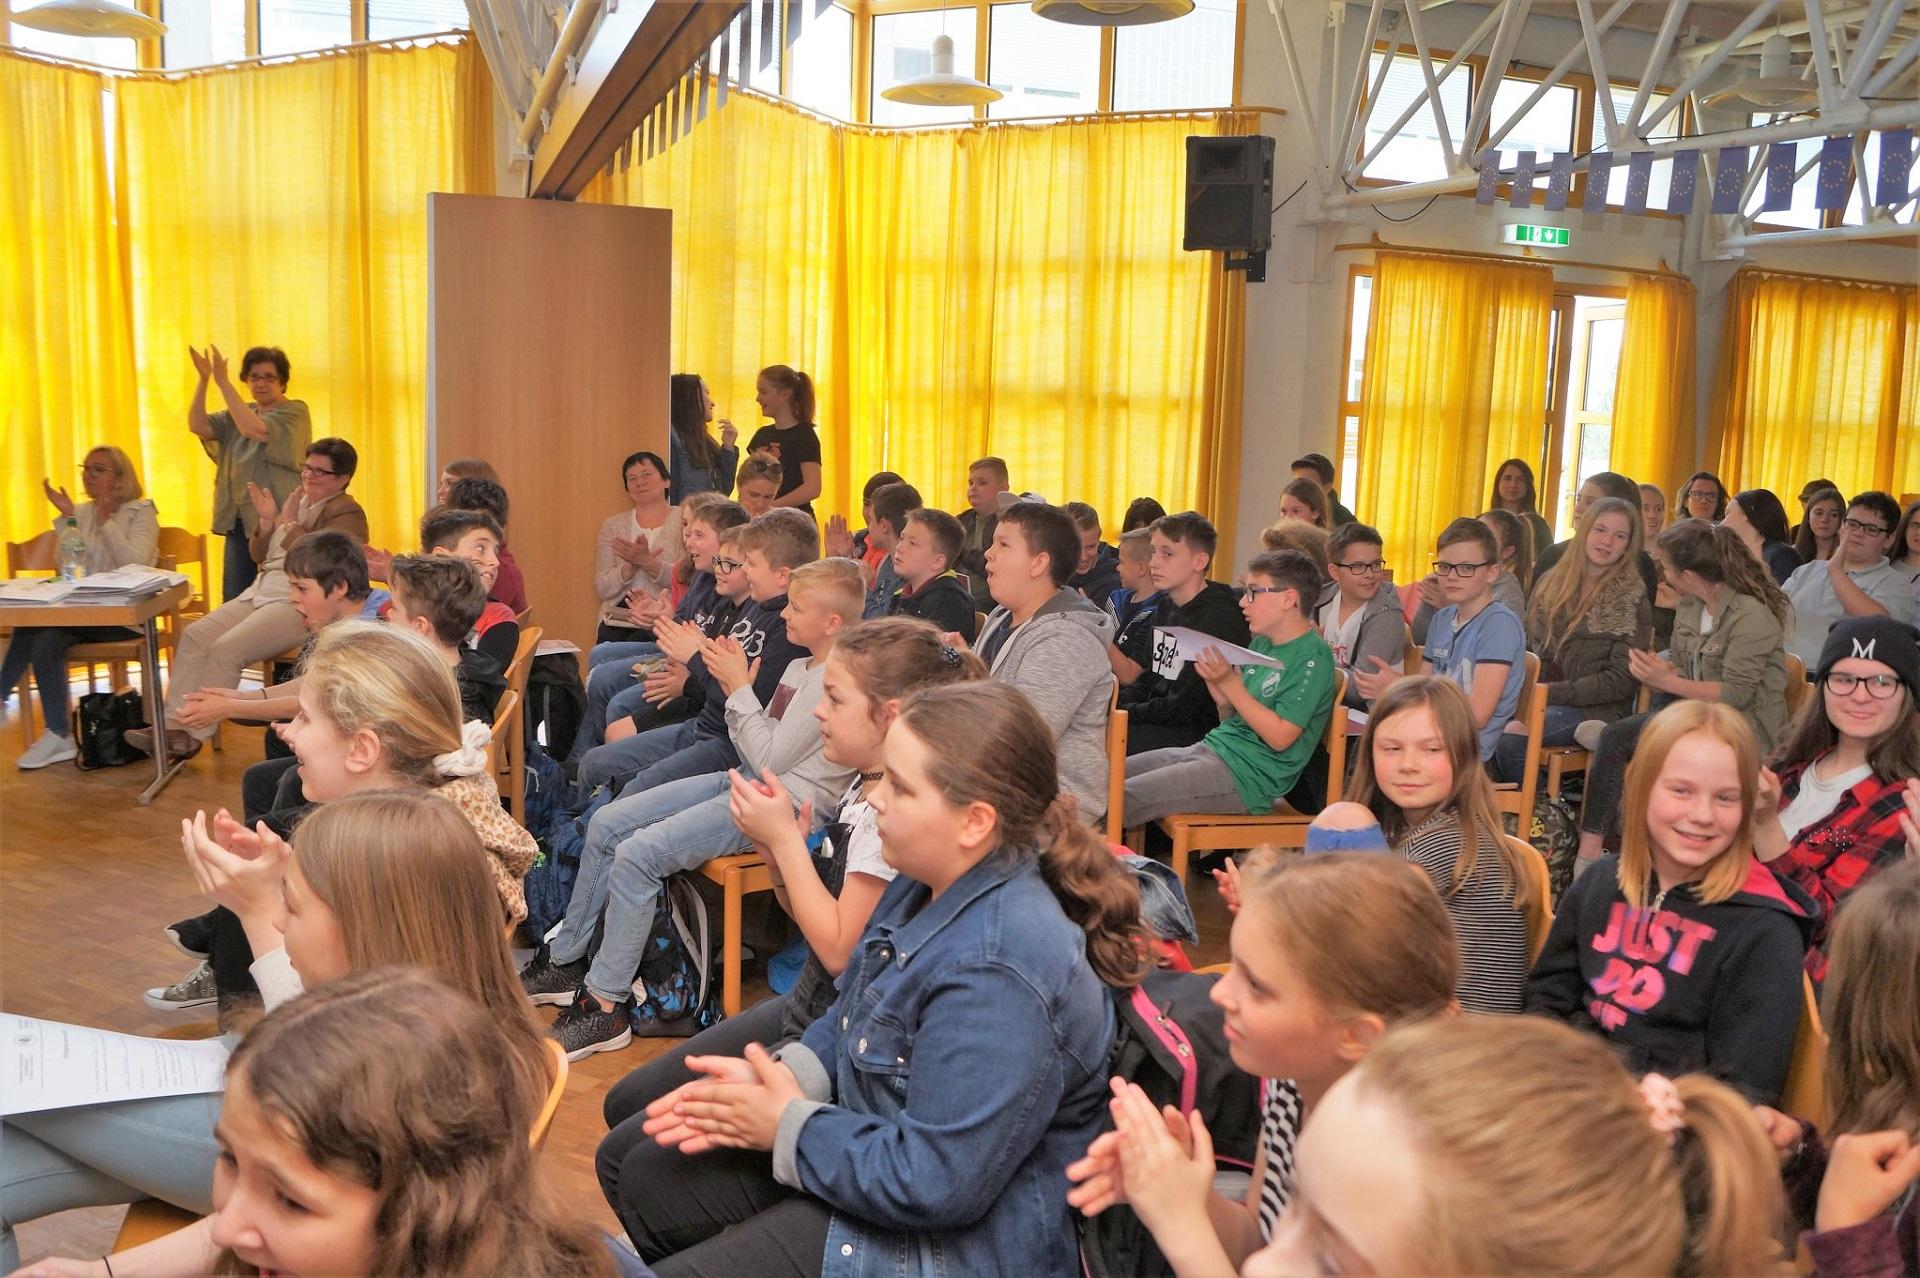 Europos diena Vasario 16-osios gimnazijoje, 2018